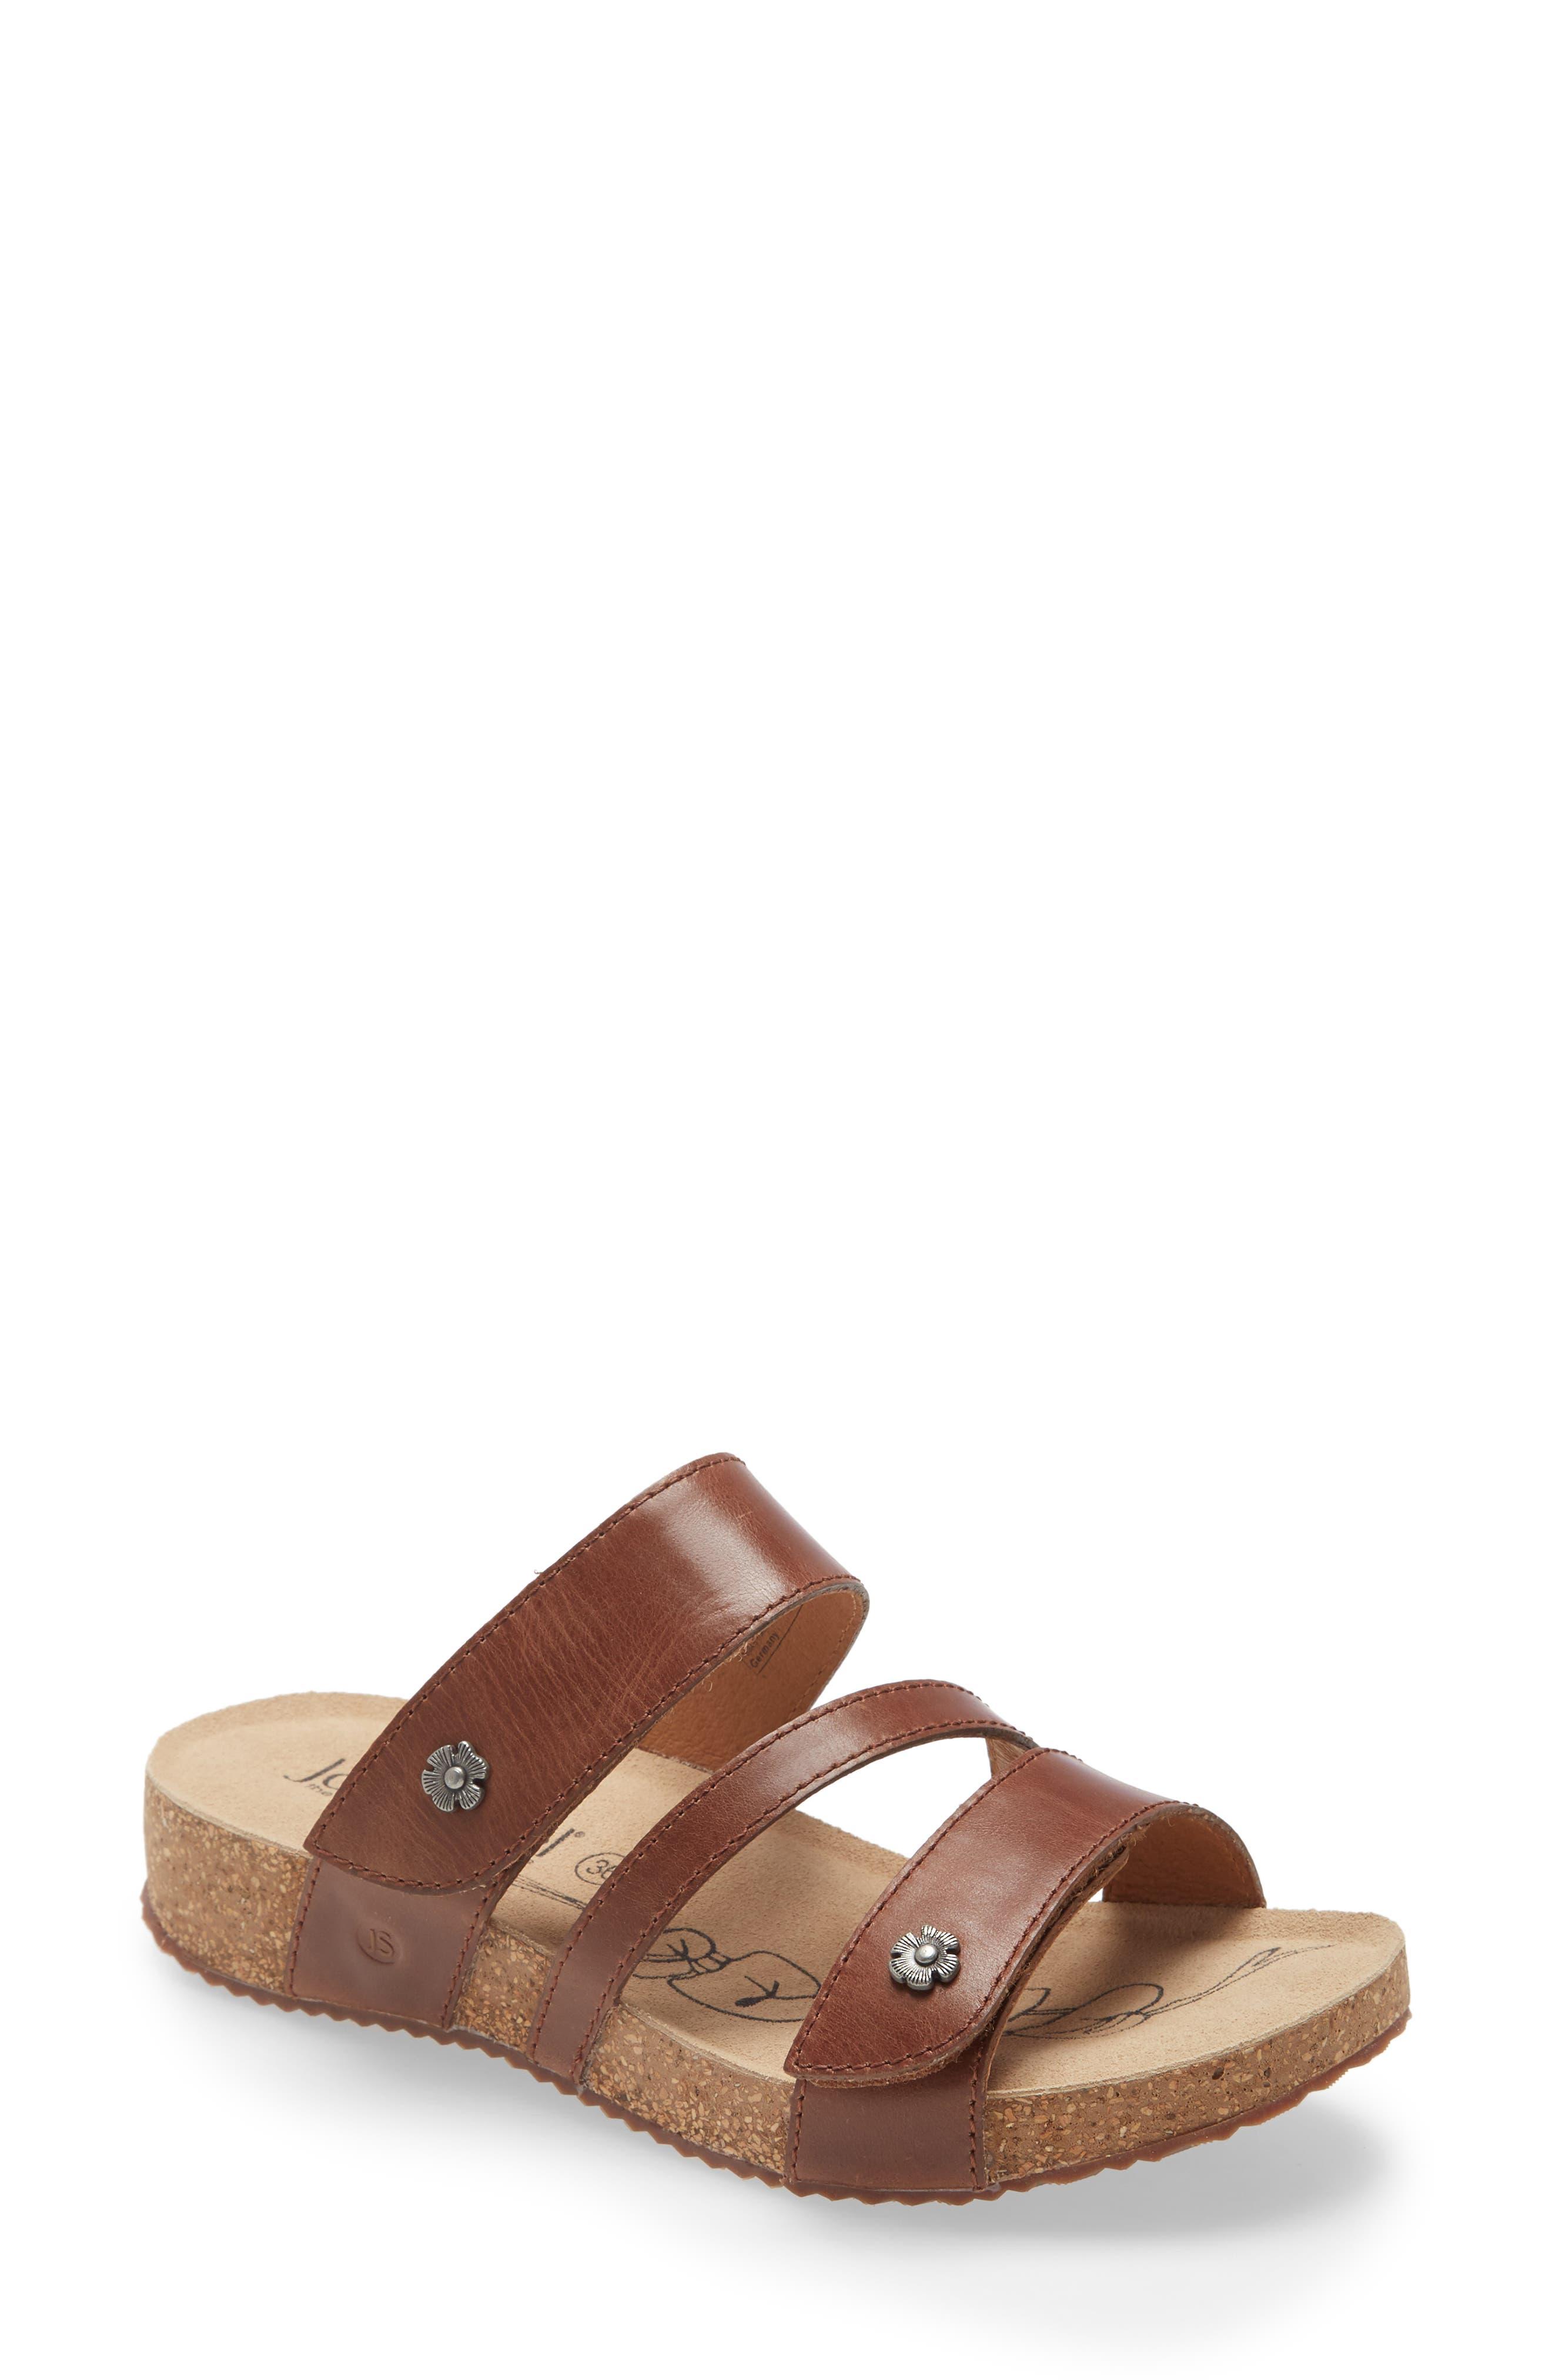 Tonga Slide Sandal